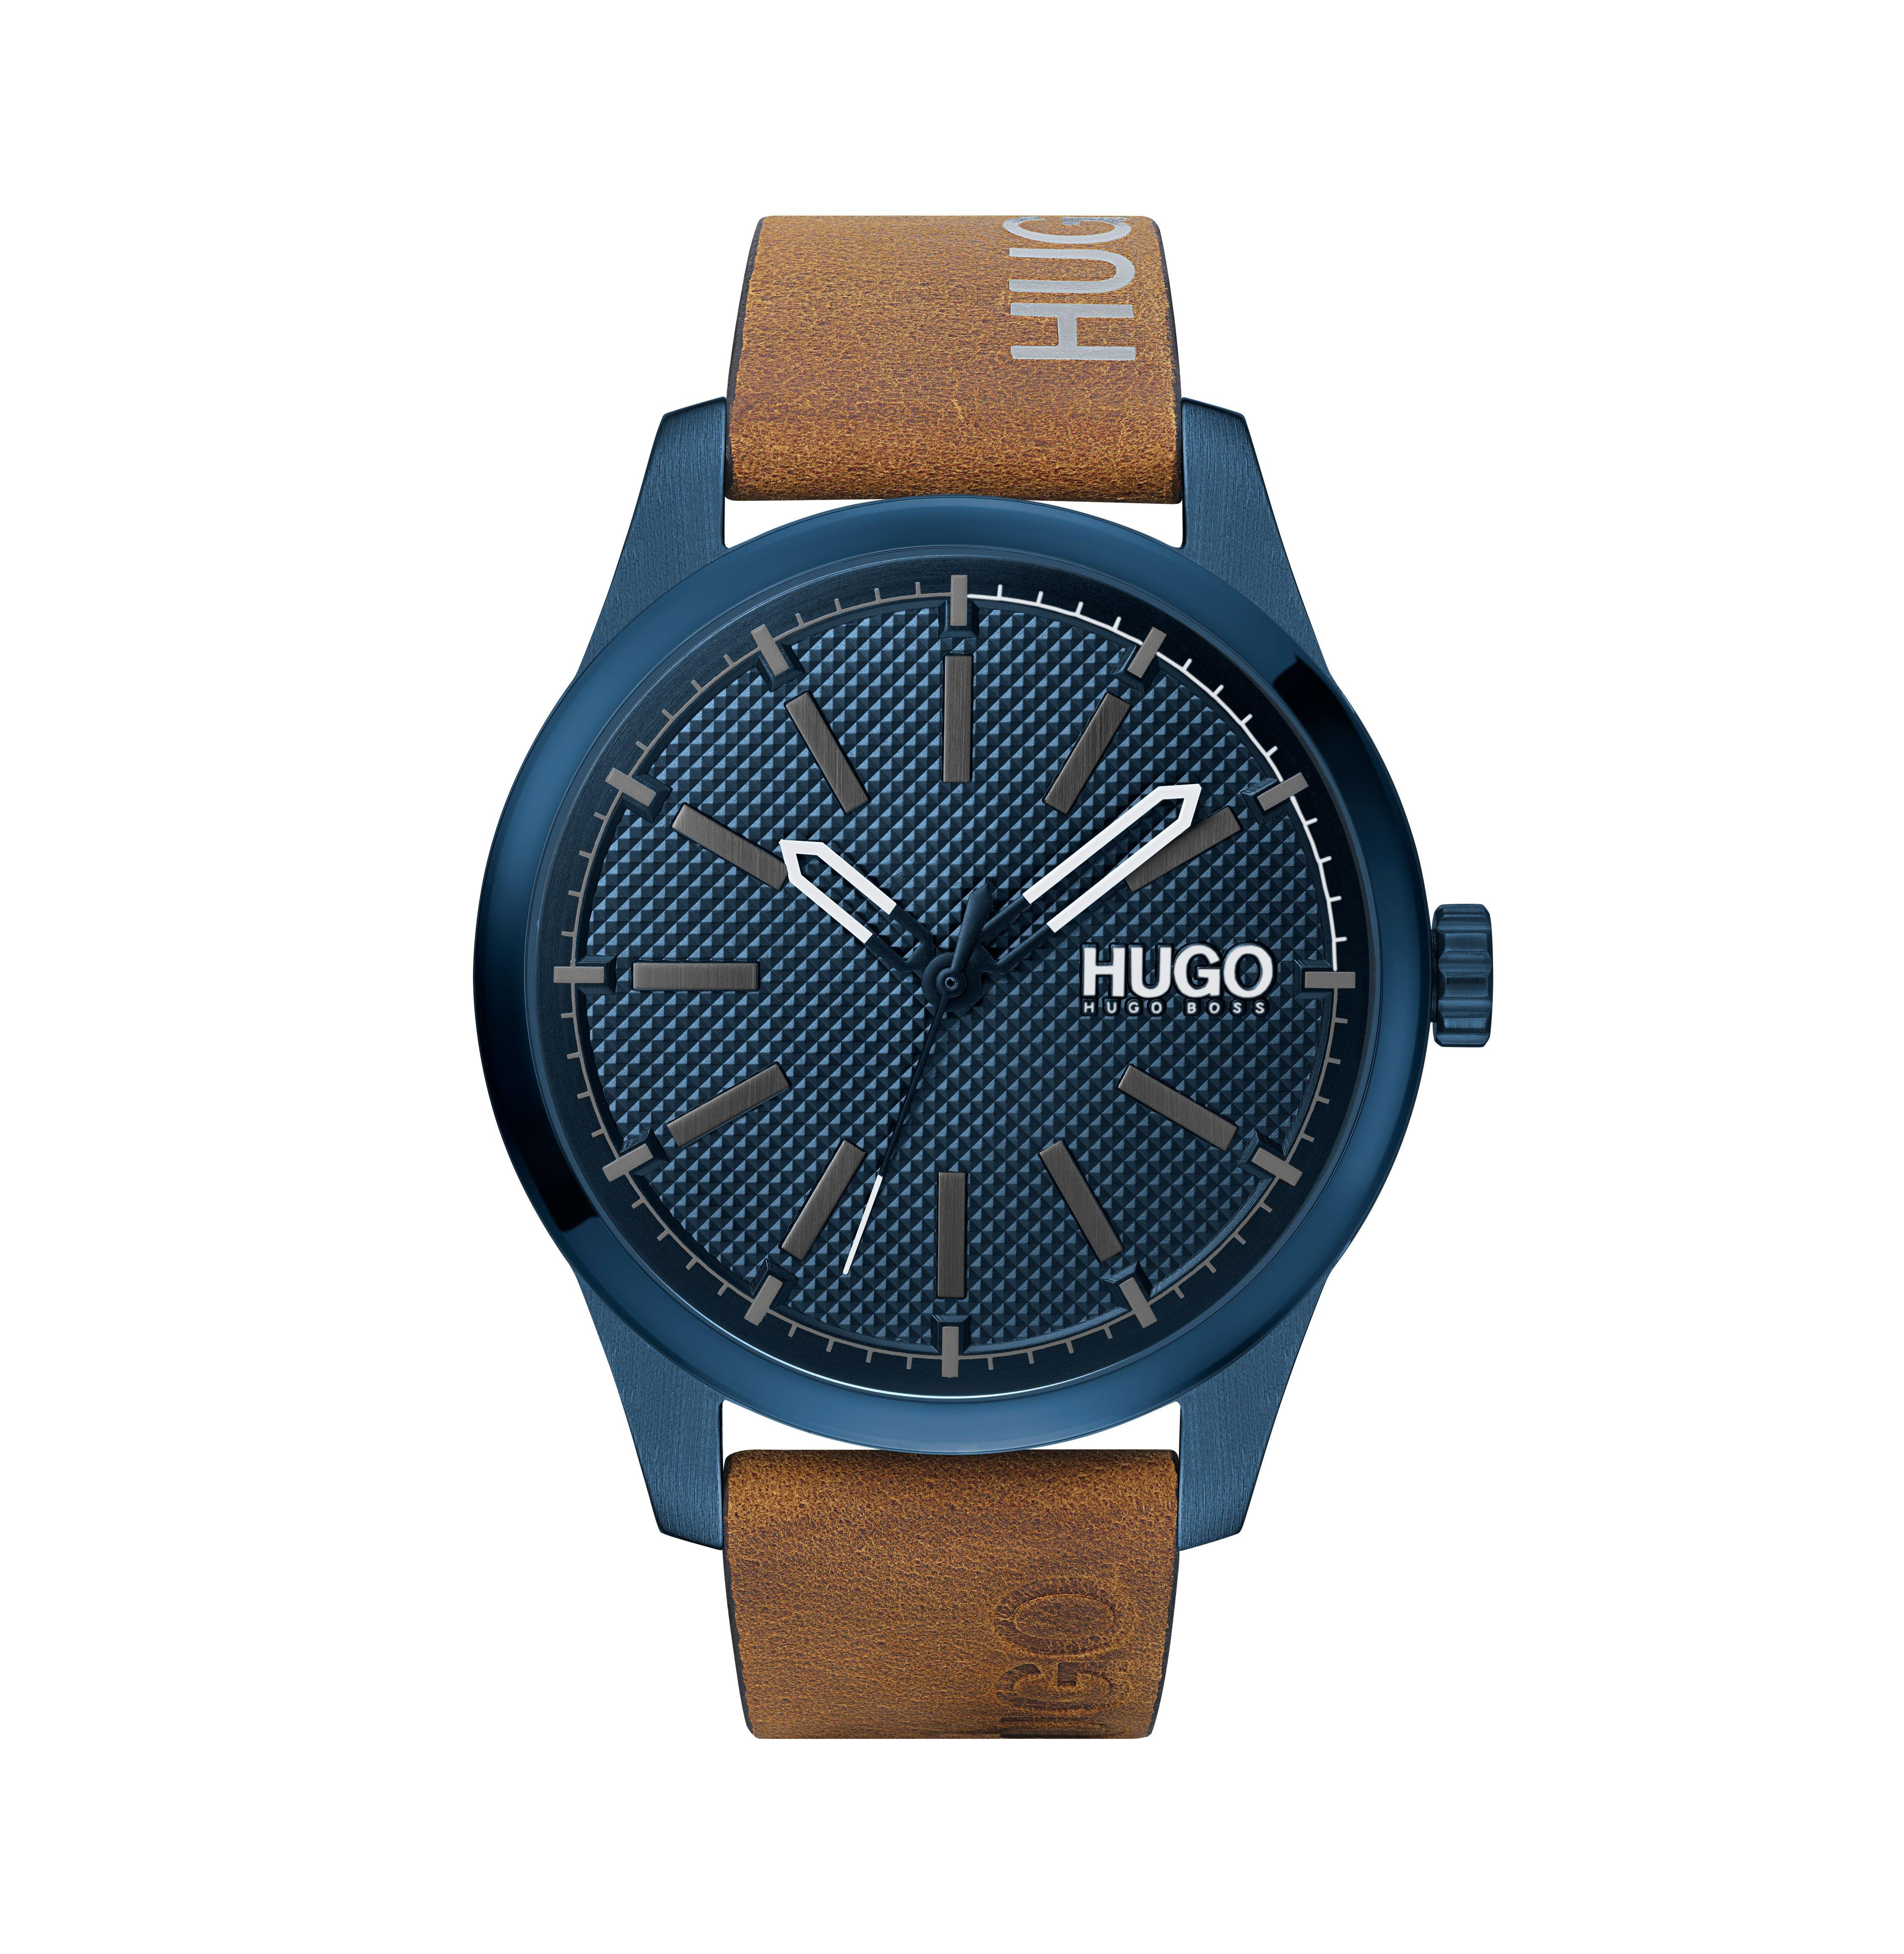 HUGO Invent Blue Men's Watch